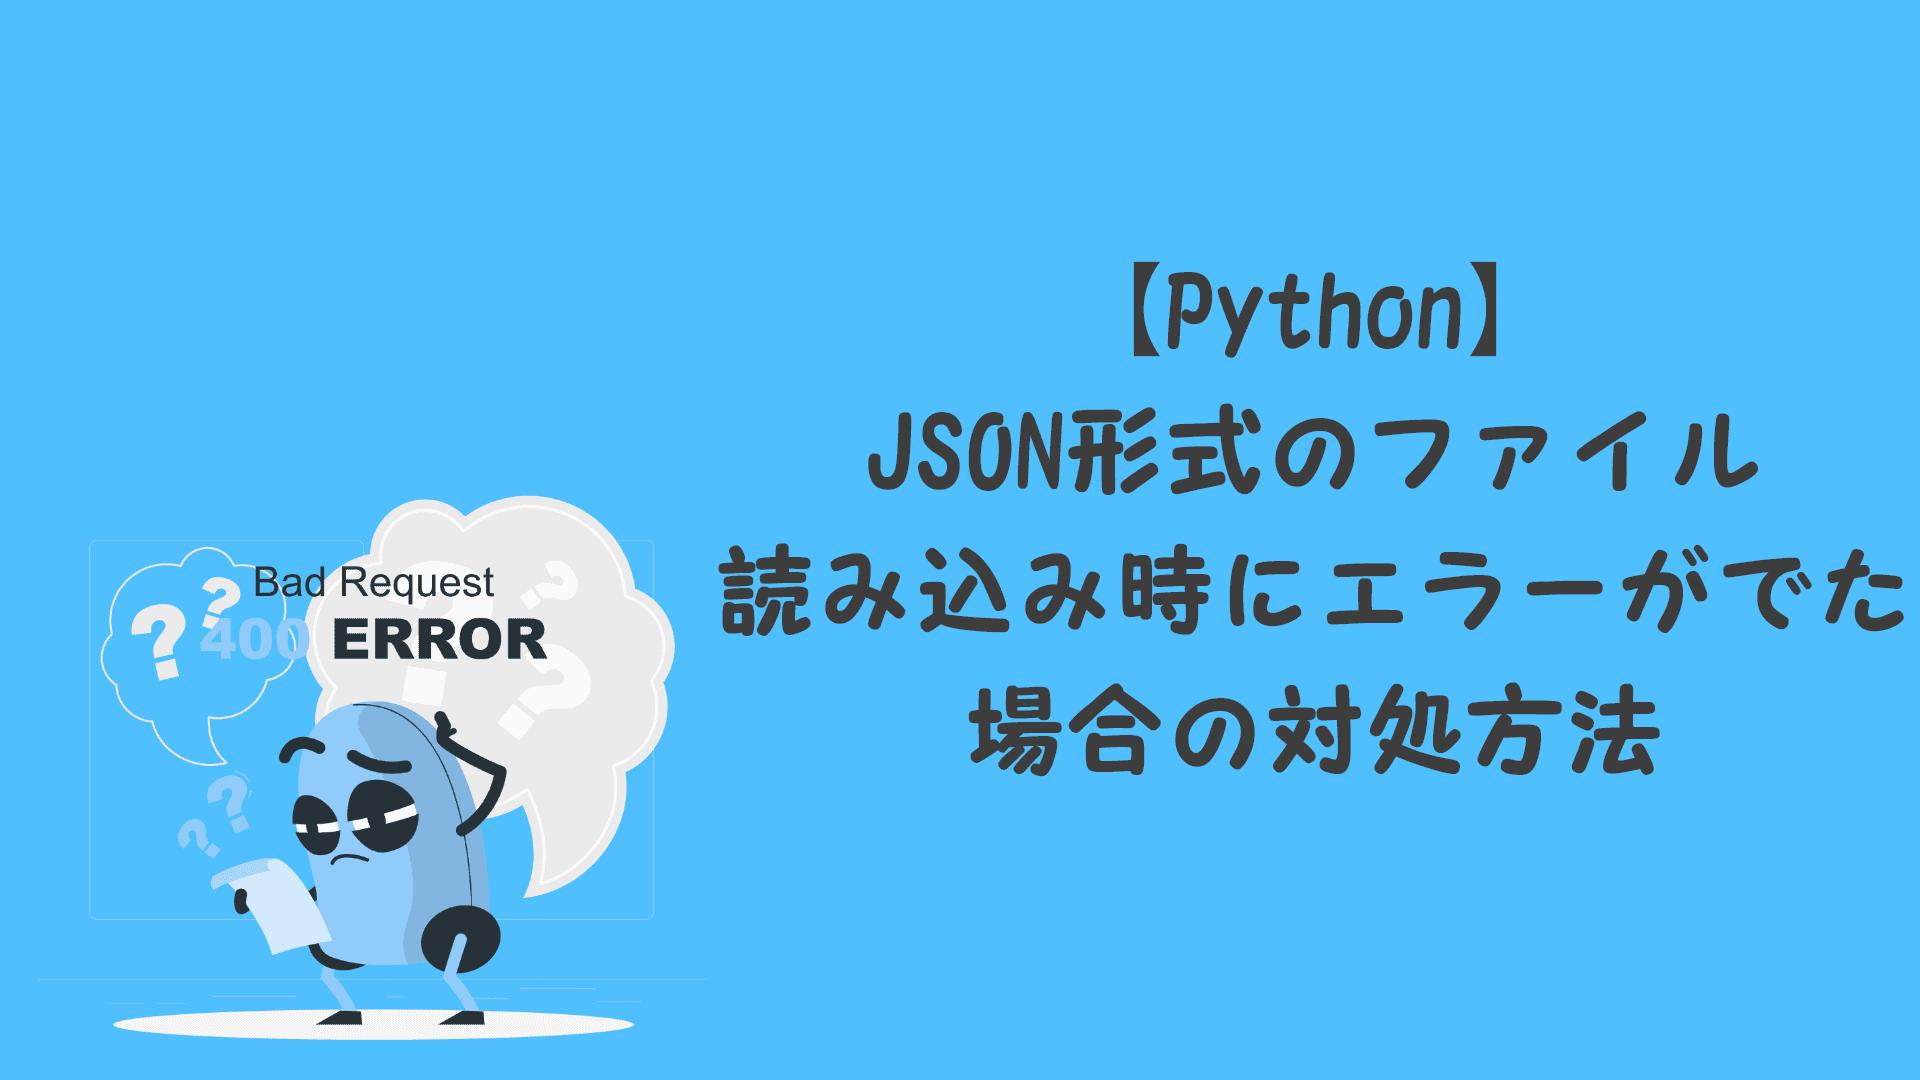 【Python】JSON形式のファイル読み込み時にエラーがでた場合の対処方法